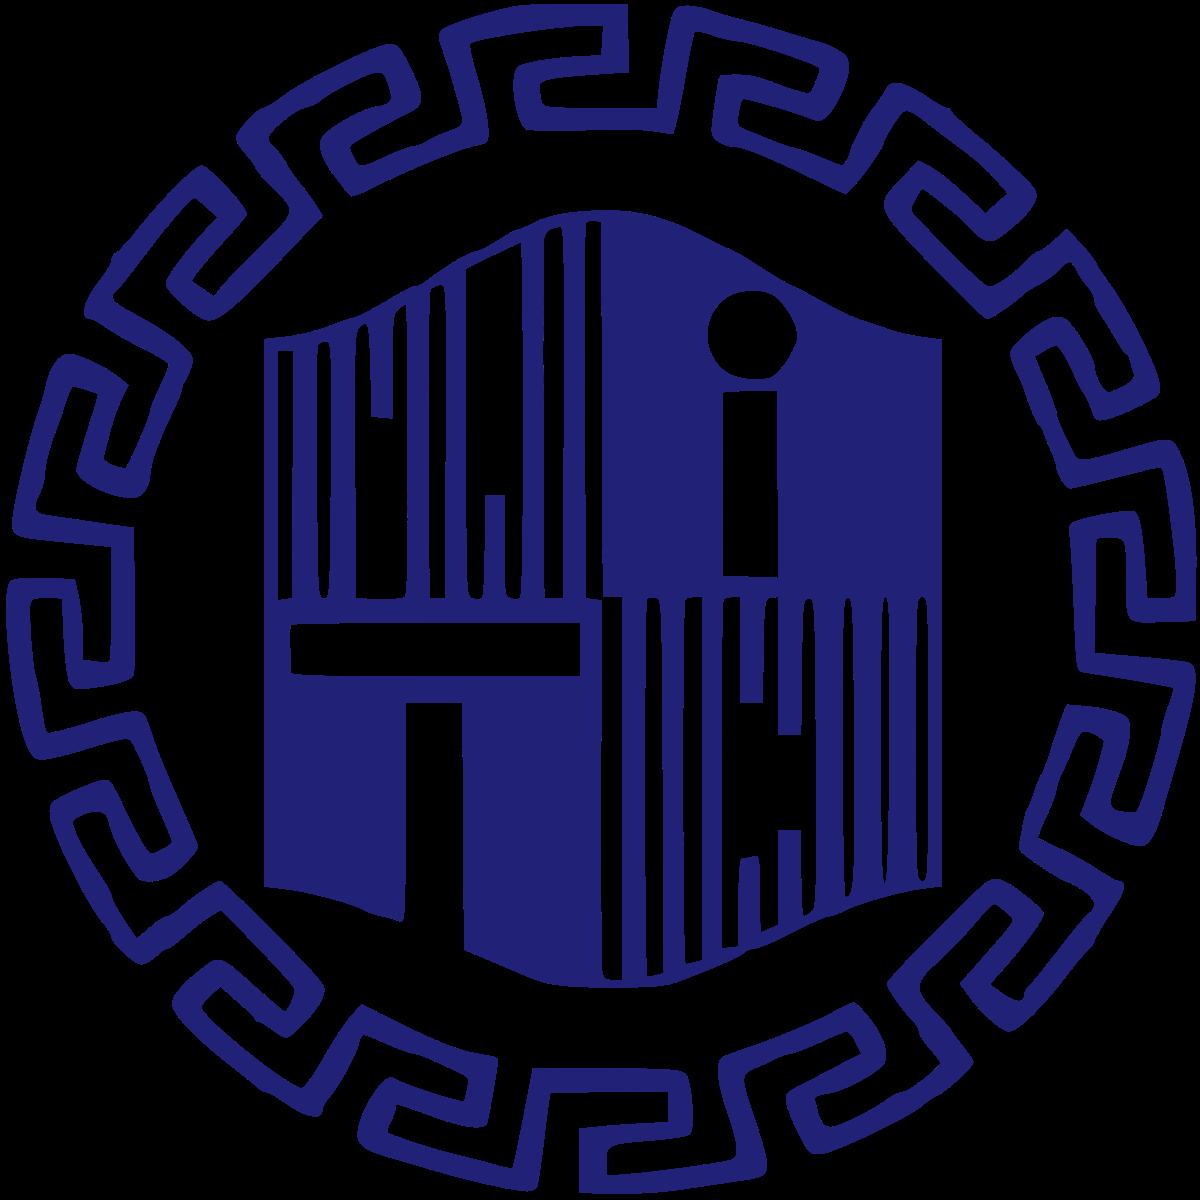 NATIONAL INSTITUTE OF TECHNOLOGY DELHI